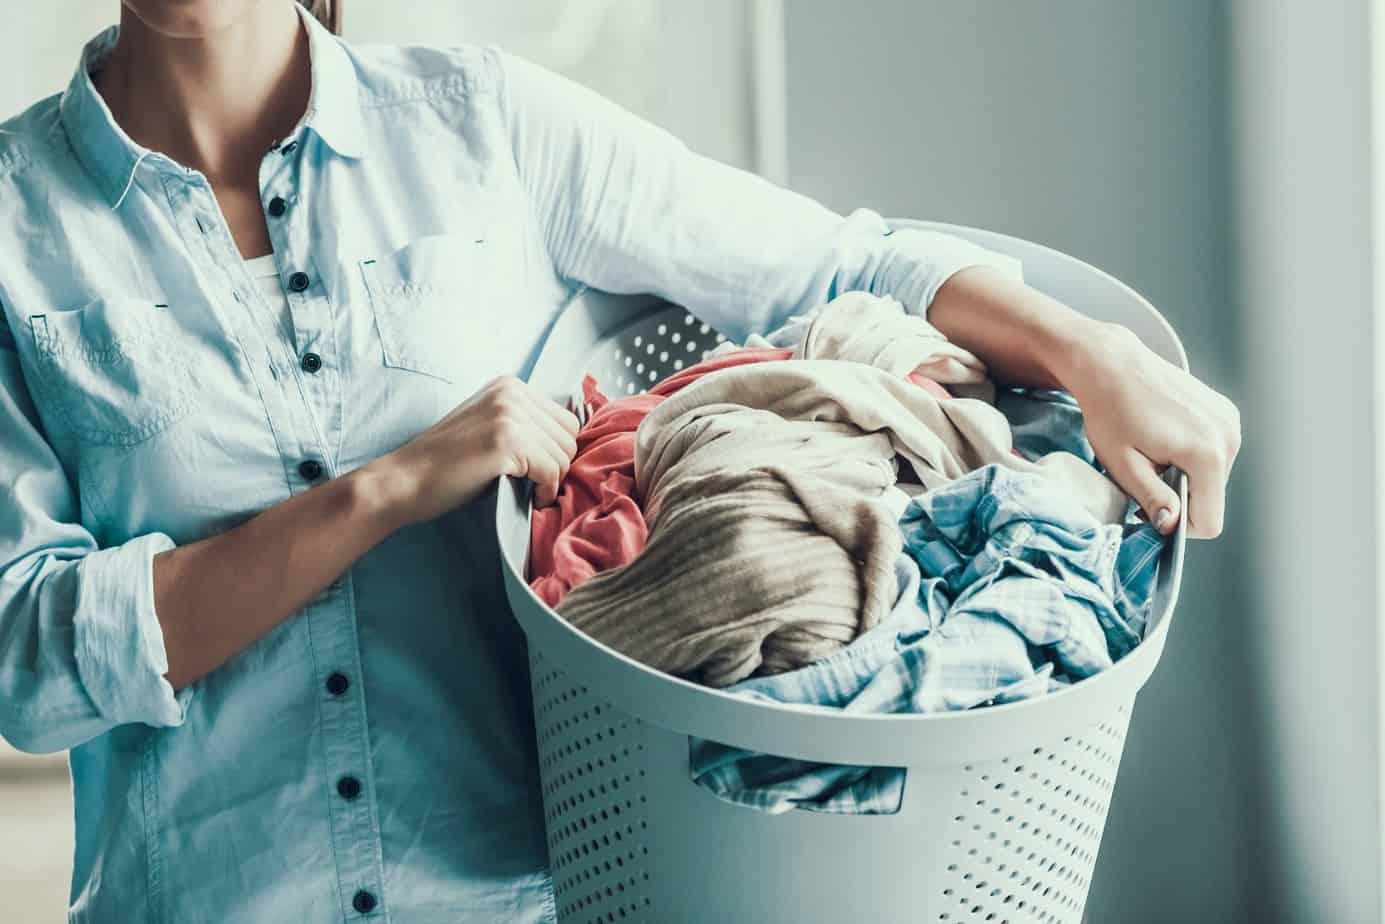 When Homemaking Makes You Feel Like a Failure